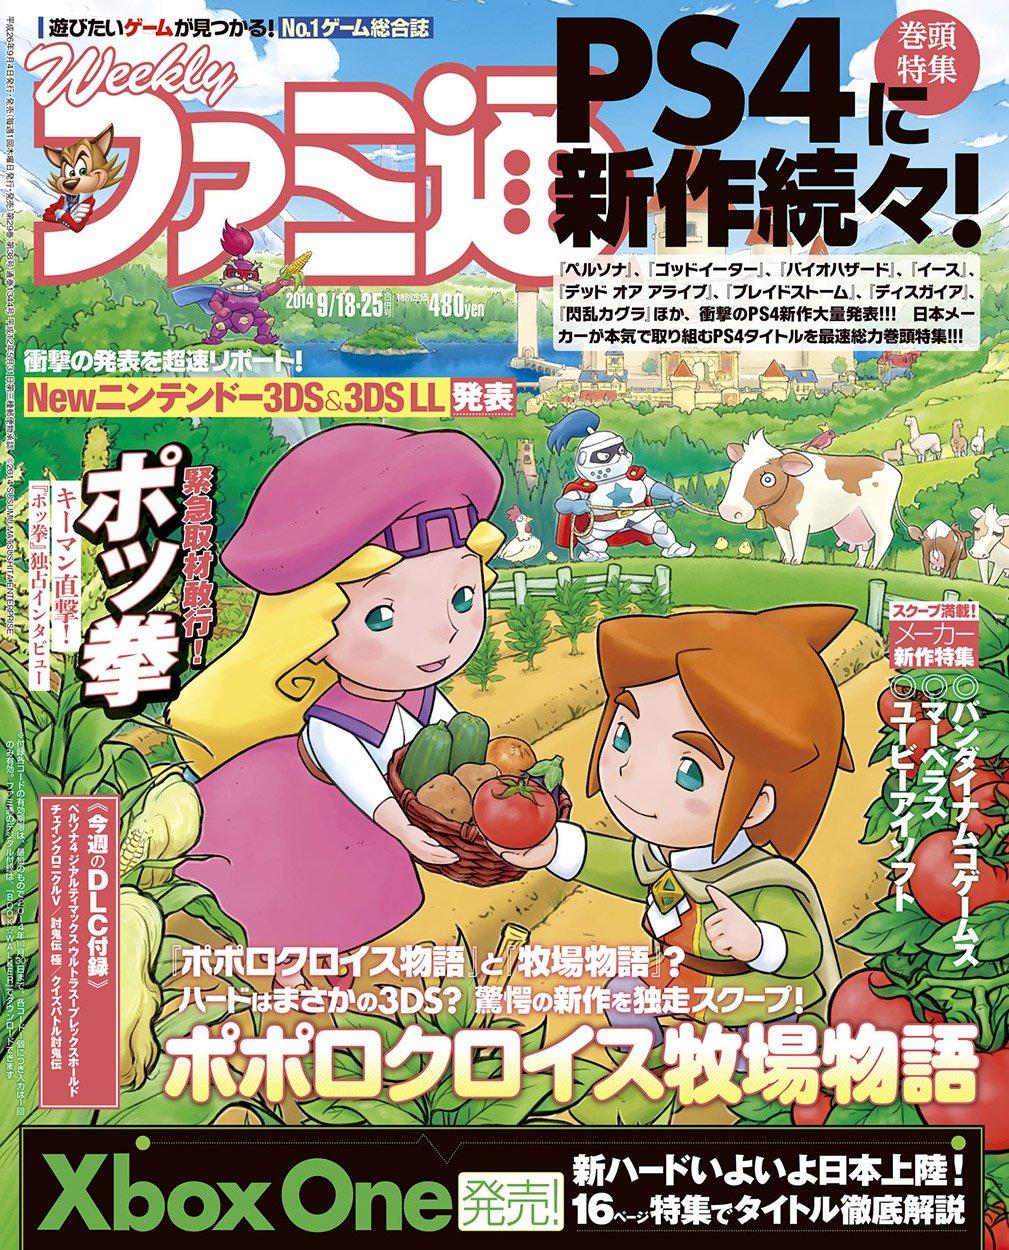 Famitsu 1344 September 18/25, 2015